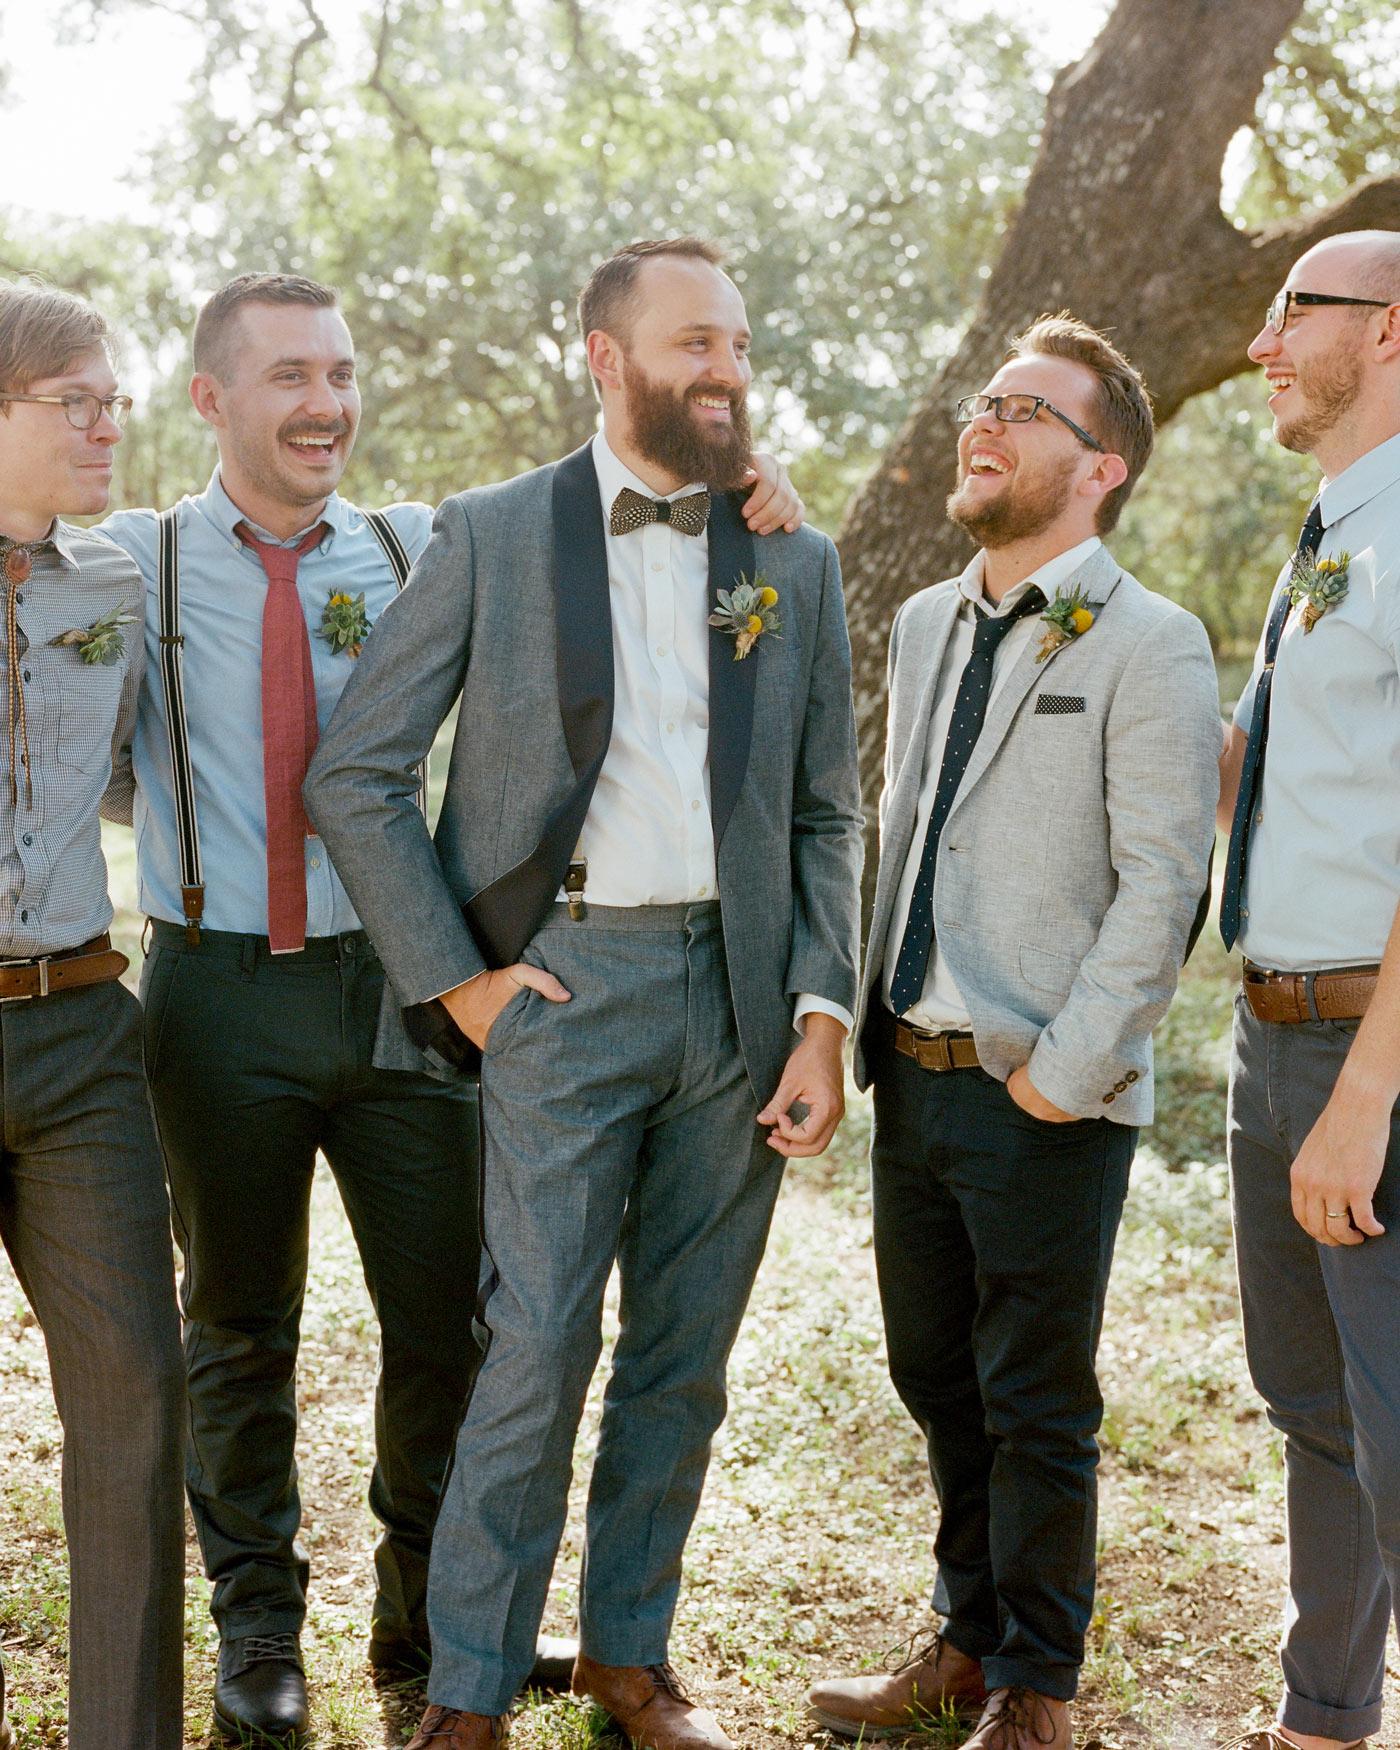 abby-chris-wedding-texas-groomsmen-0317-s112832-0516.jpg